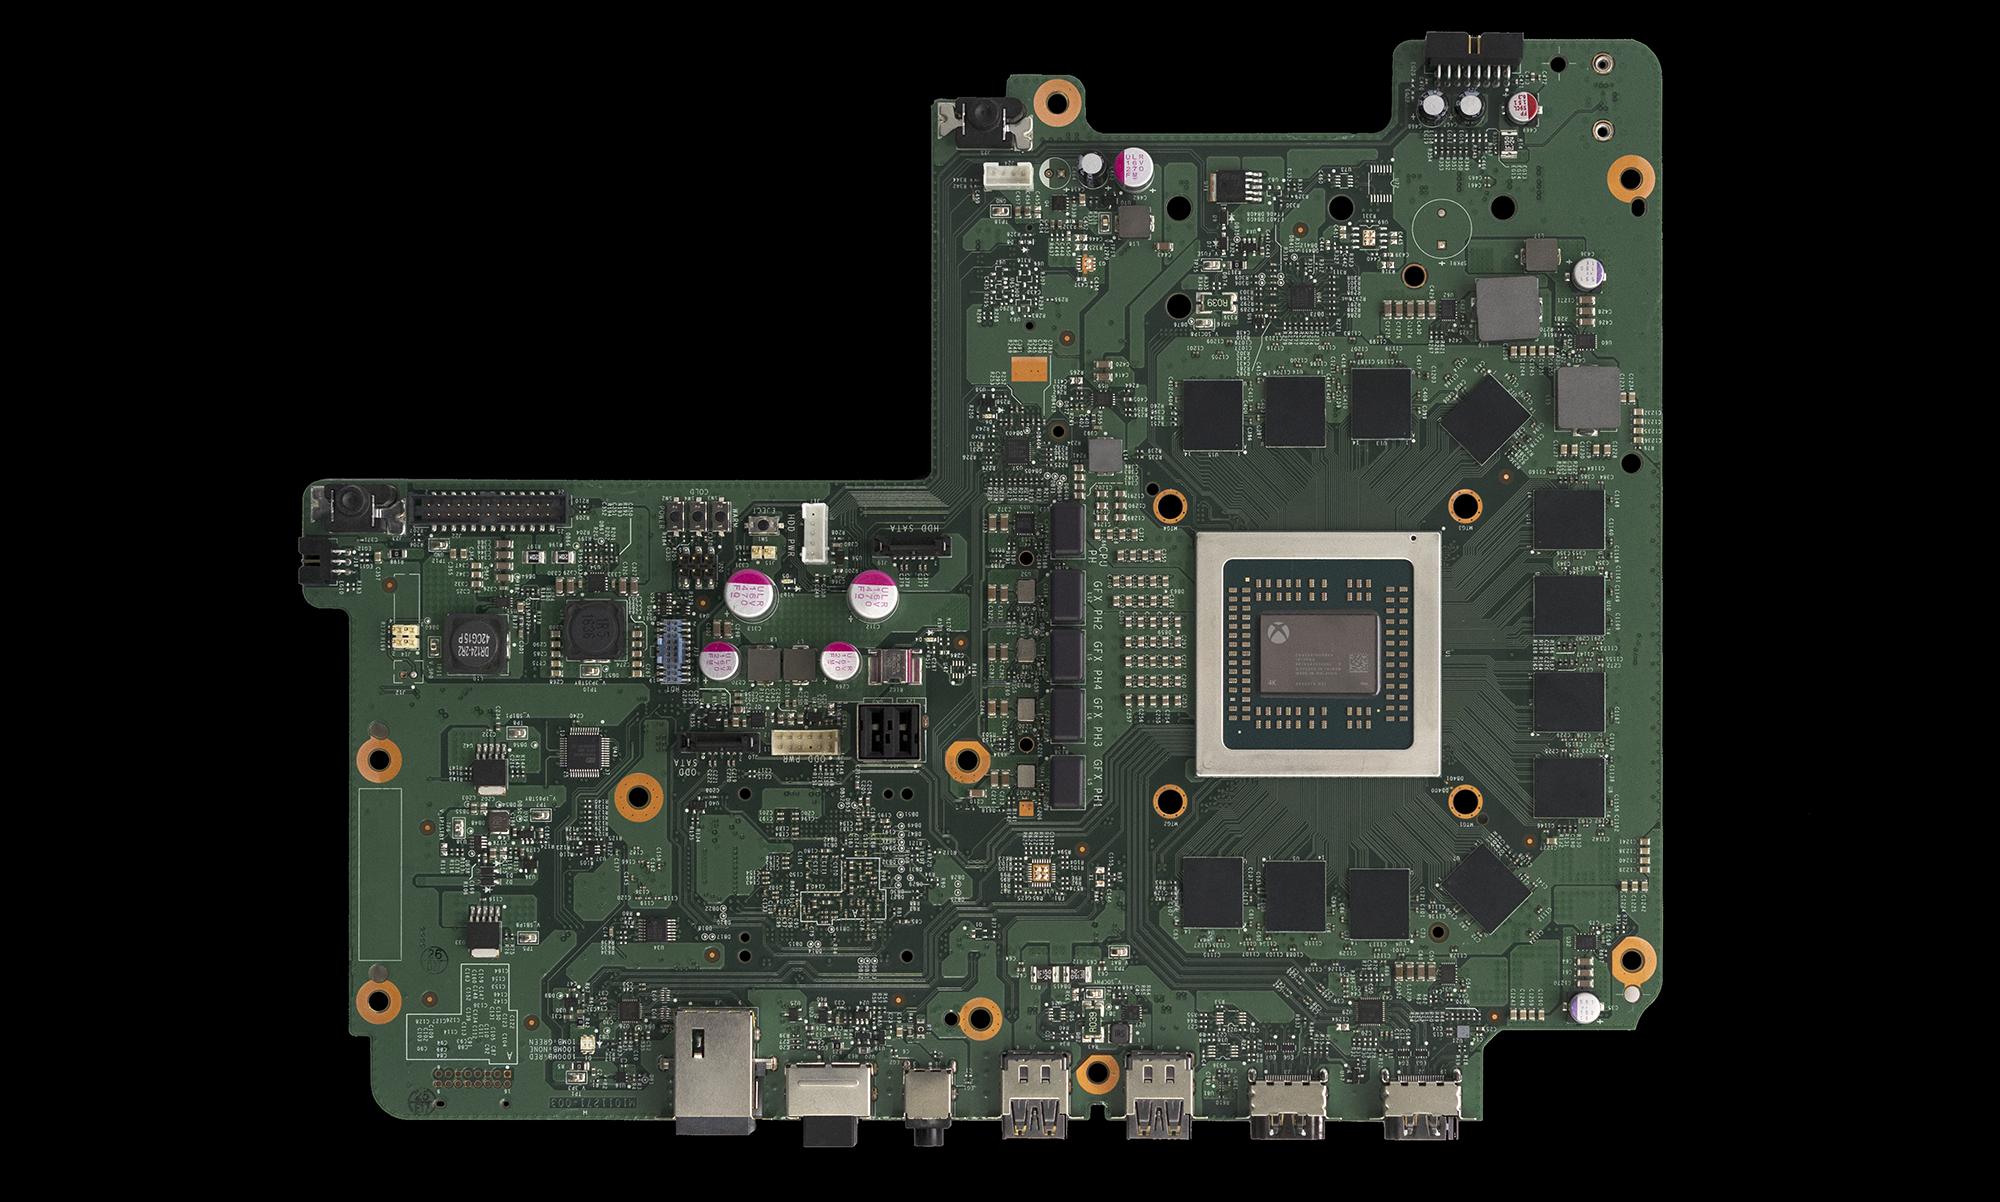 Powering Xbox One X: Custom AMD APU - The Xbox One X Review: Putting